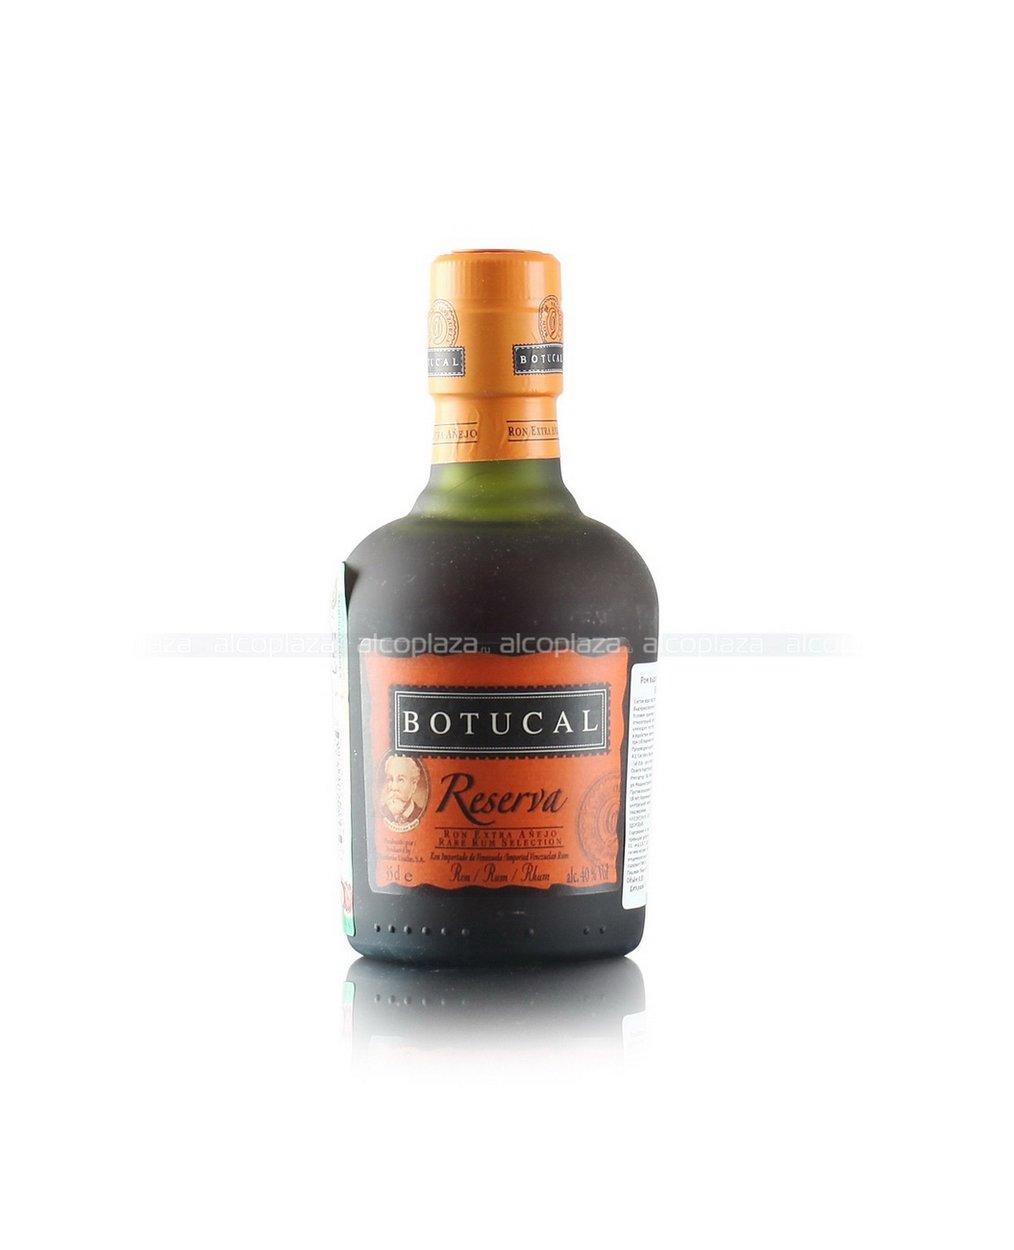 Botucal Reserva 350 ml ром Ботукал Резерва 0.35 л.